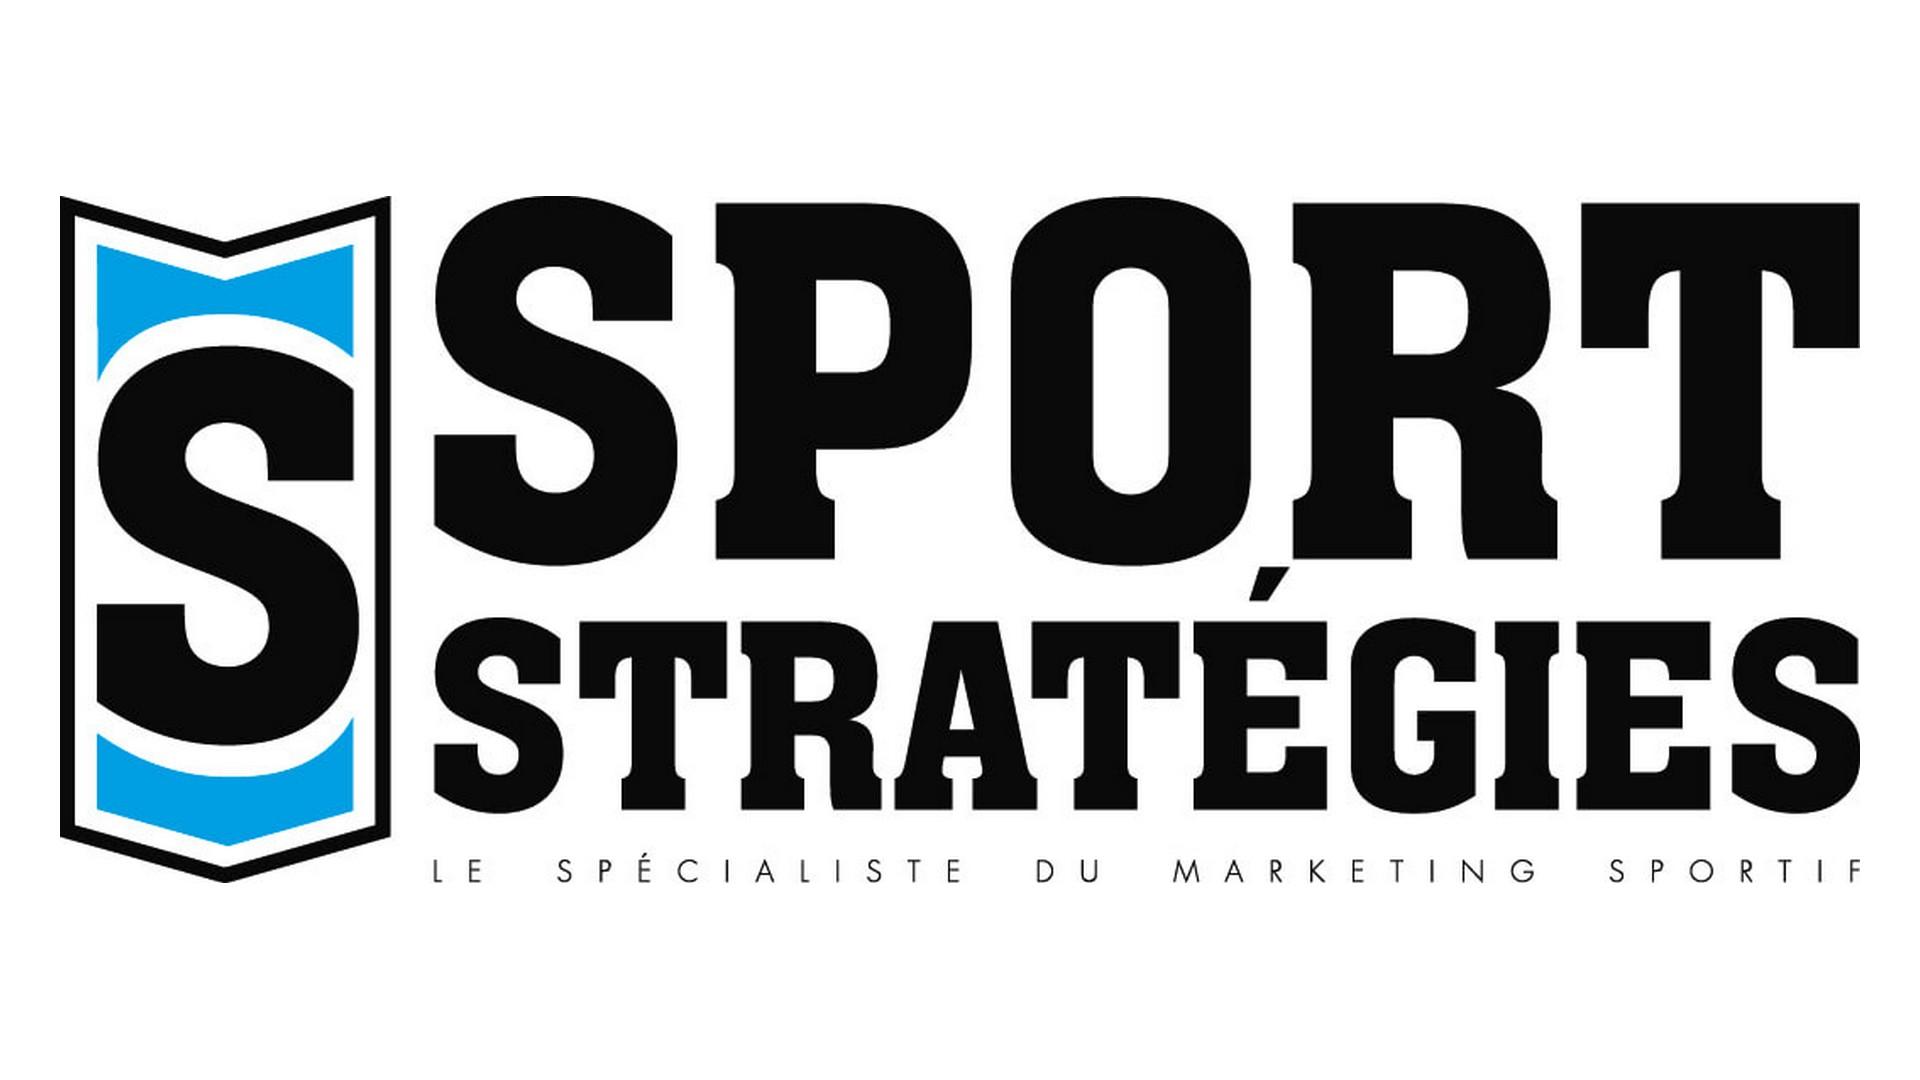 Sport Stratégies (1) Logo